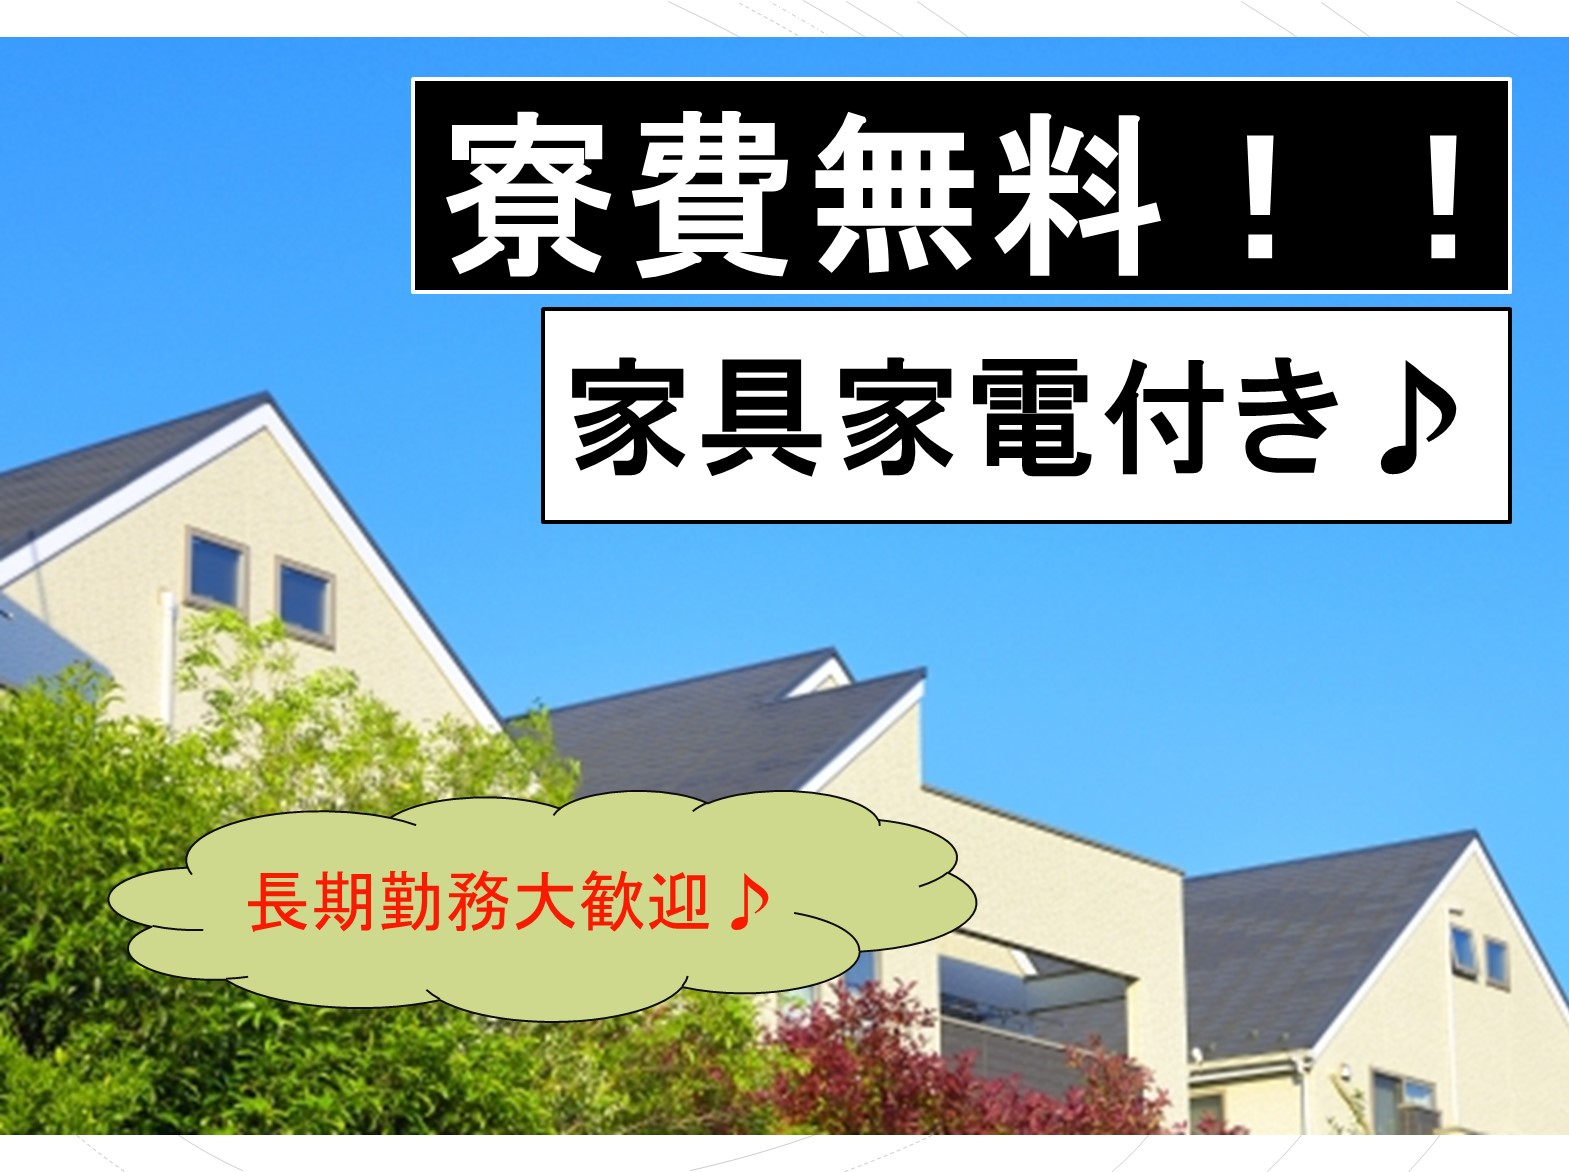 寮費無料!高時給1200円!電子部品の加工業務(福井県) イメージ